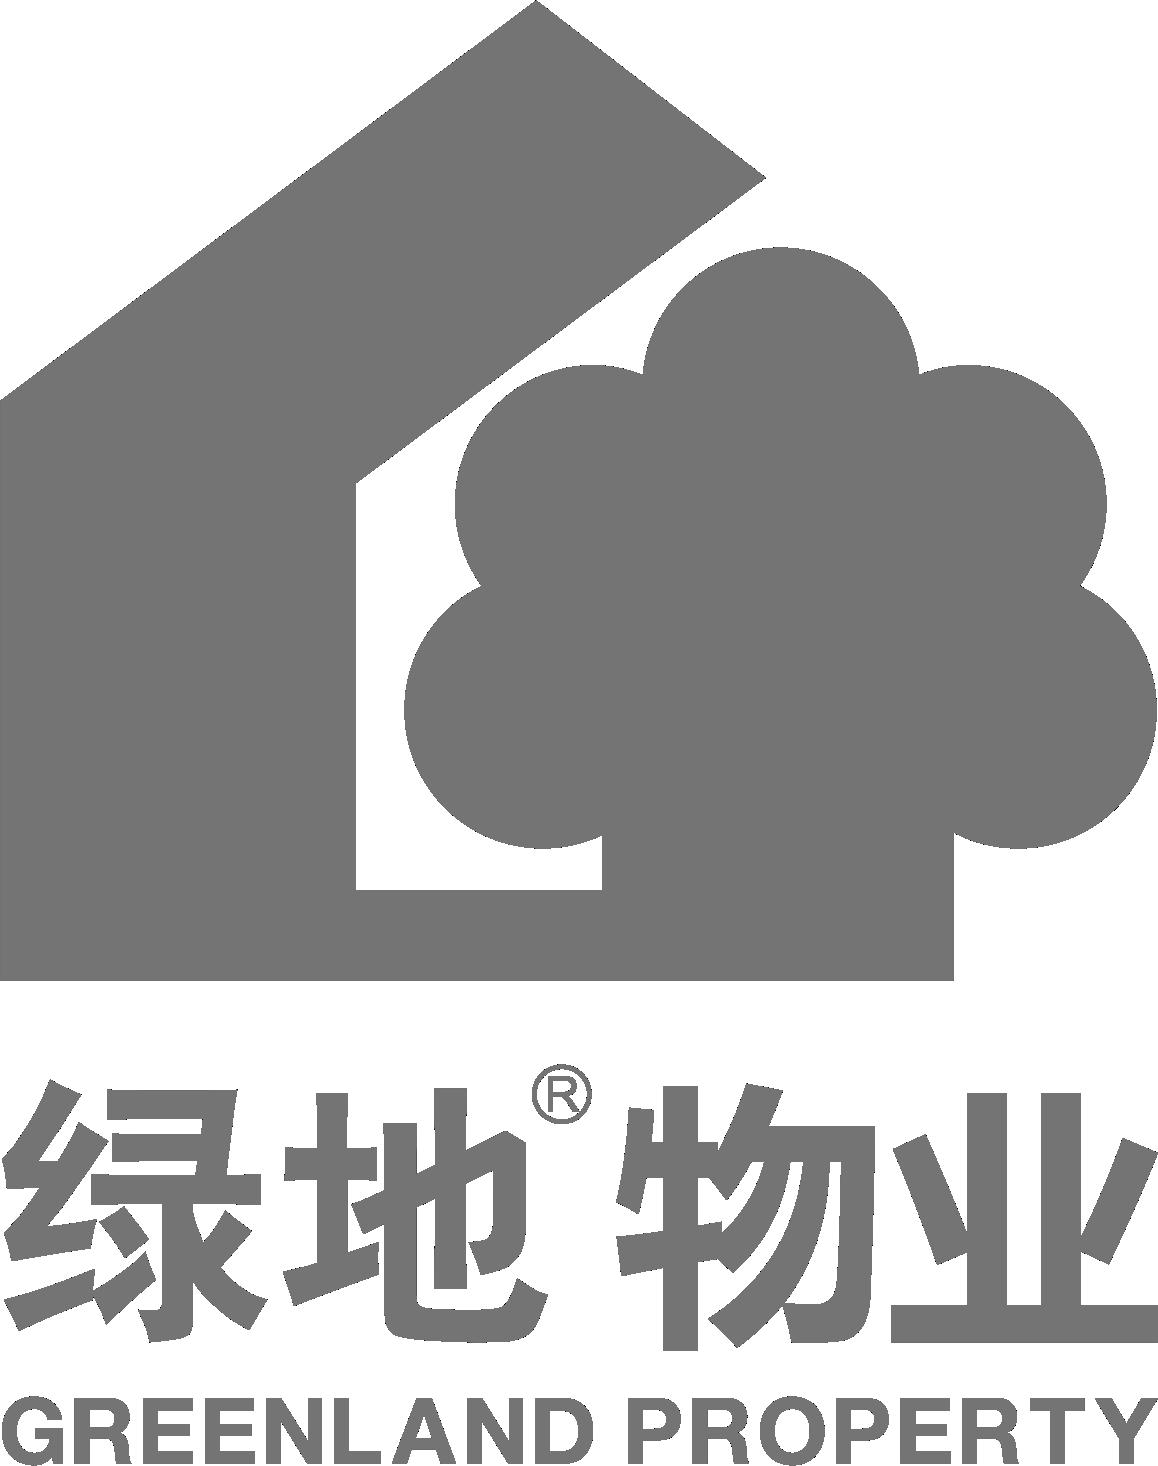 logo logo 标志 设计 矢量 矢量图 素材 图标 1158_1466 竖版 竖屏